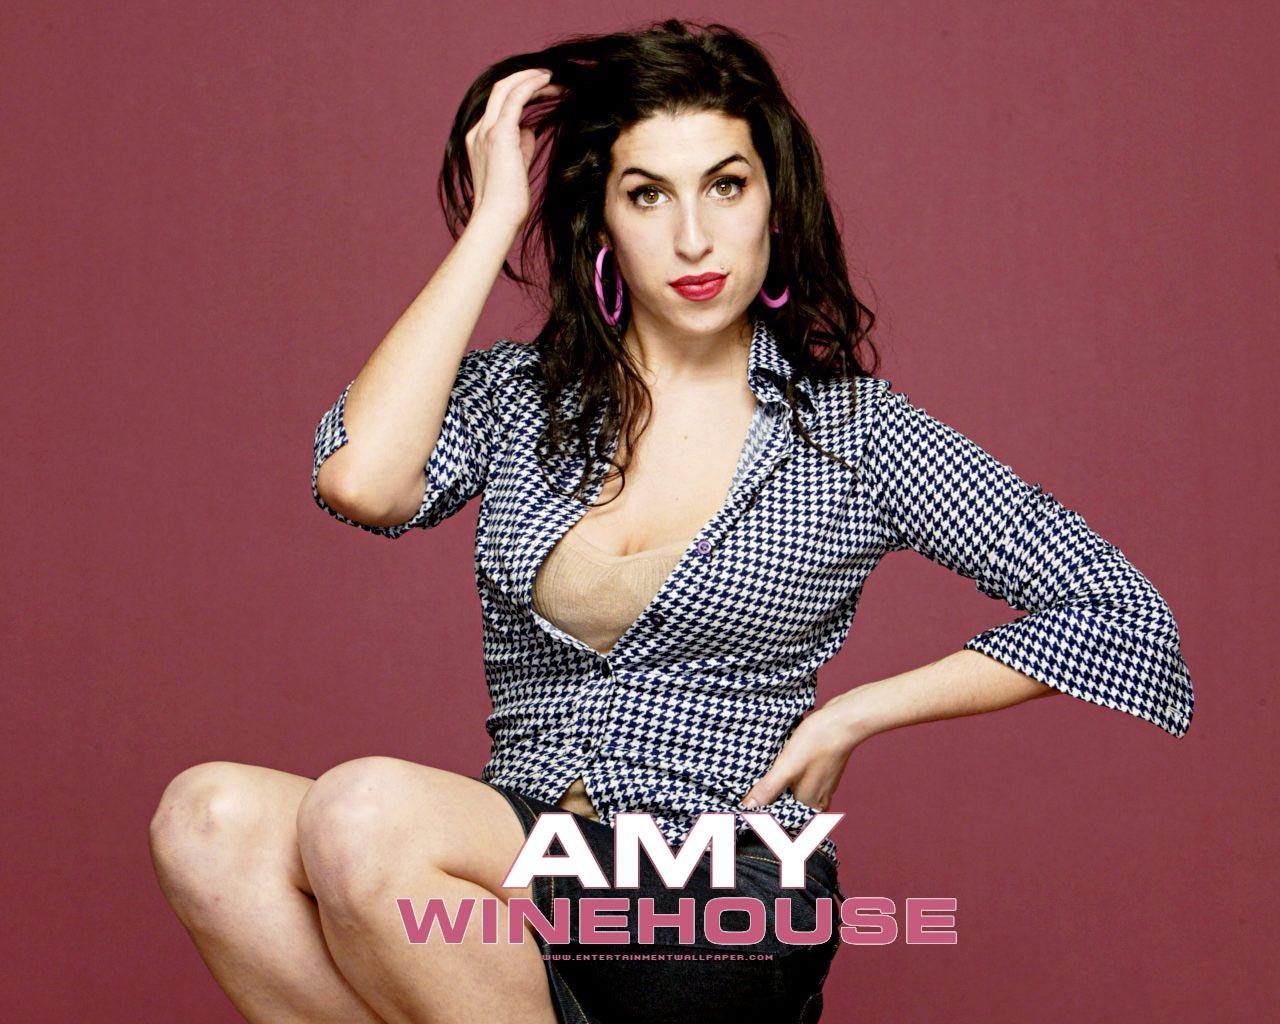 https://3.bp.blogspot.com/-pyEqyEVuiQU/TlaVrkm9I-I/AAAAAAAAL5Q/NShfzV0RVxw/s1600/Amy-Winehouse_01.jpg